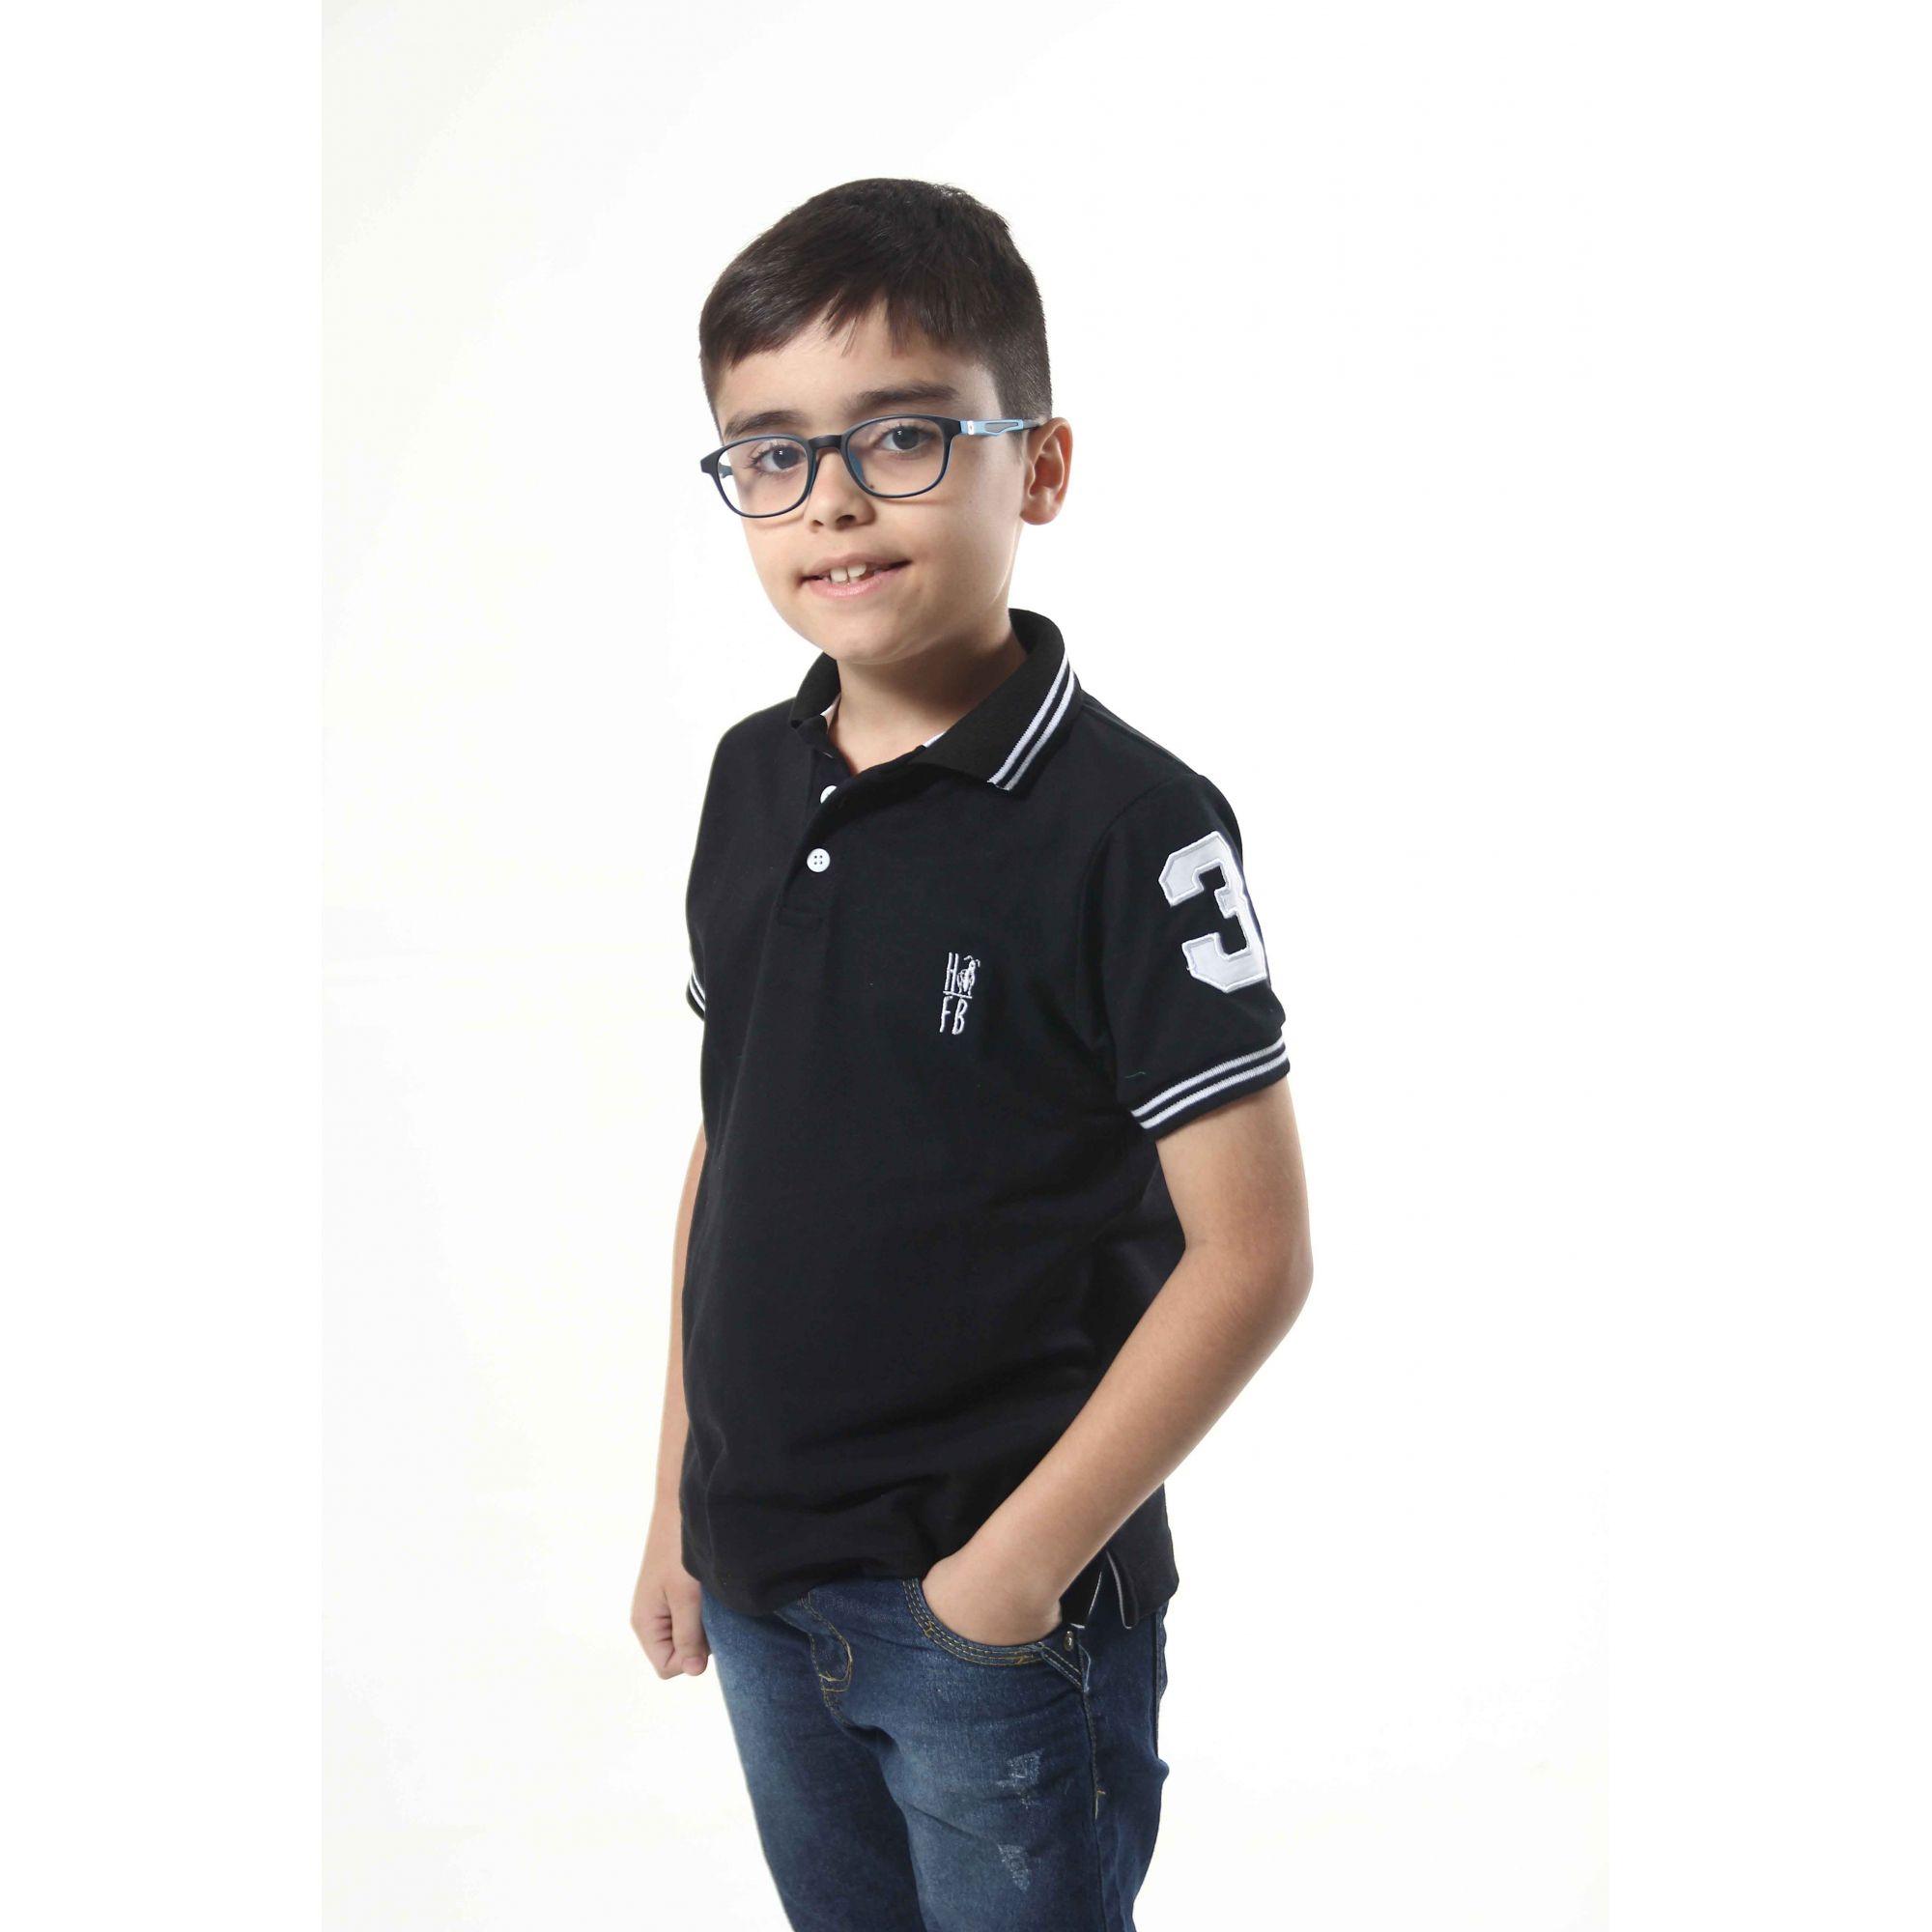 PAI E FILHO > Kit 02 Camisas ou Body Polo Preto Elegância  [Coleção Tal Pai Tal Filho]  - Heitor Fashion Brazil